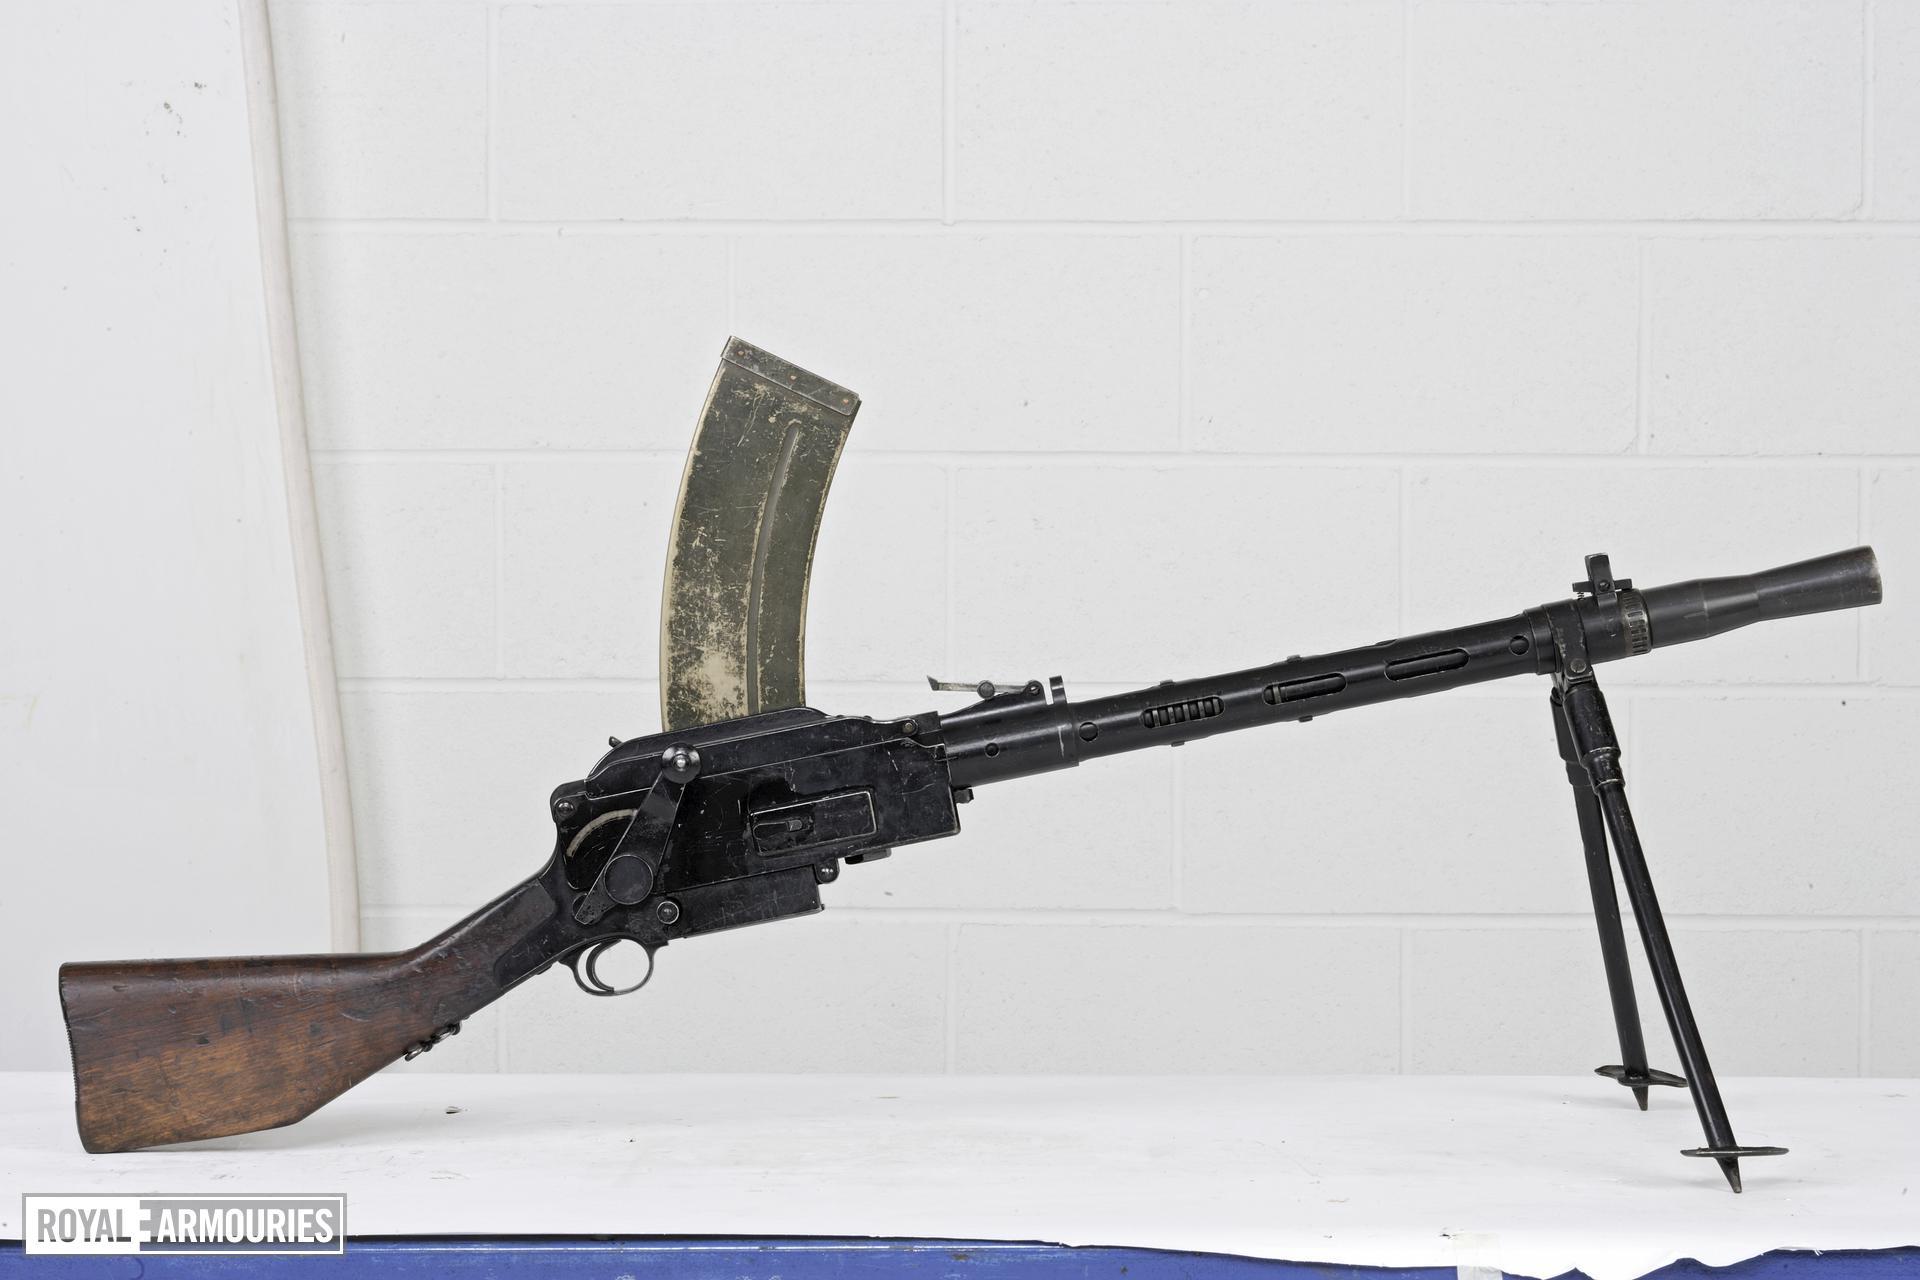 Centrefire automatic light machine gun - Madsen Model 1946